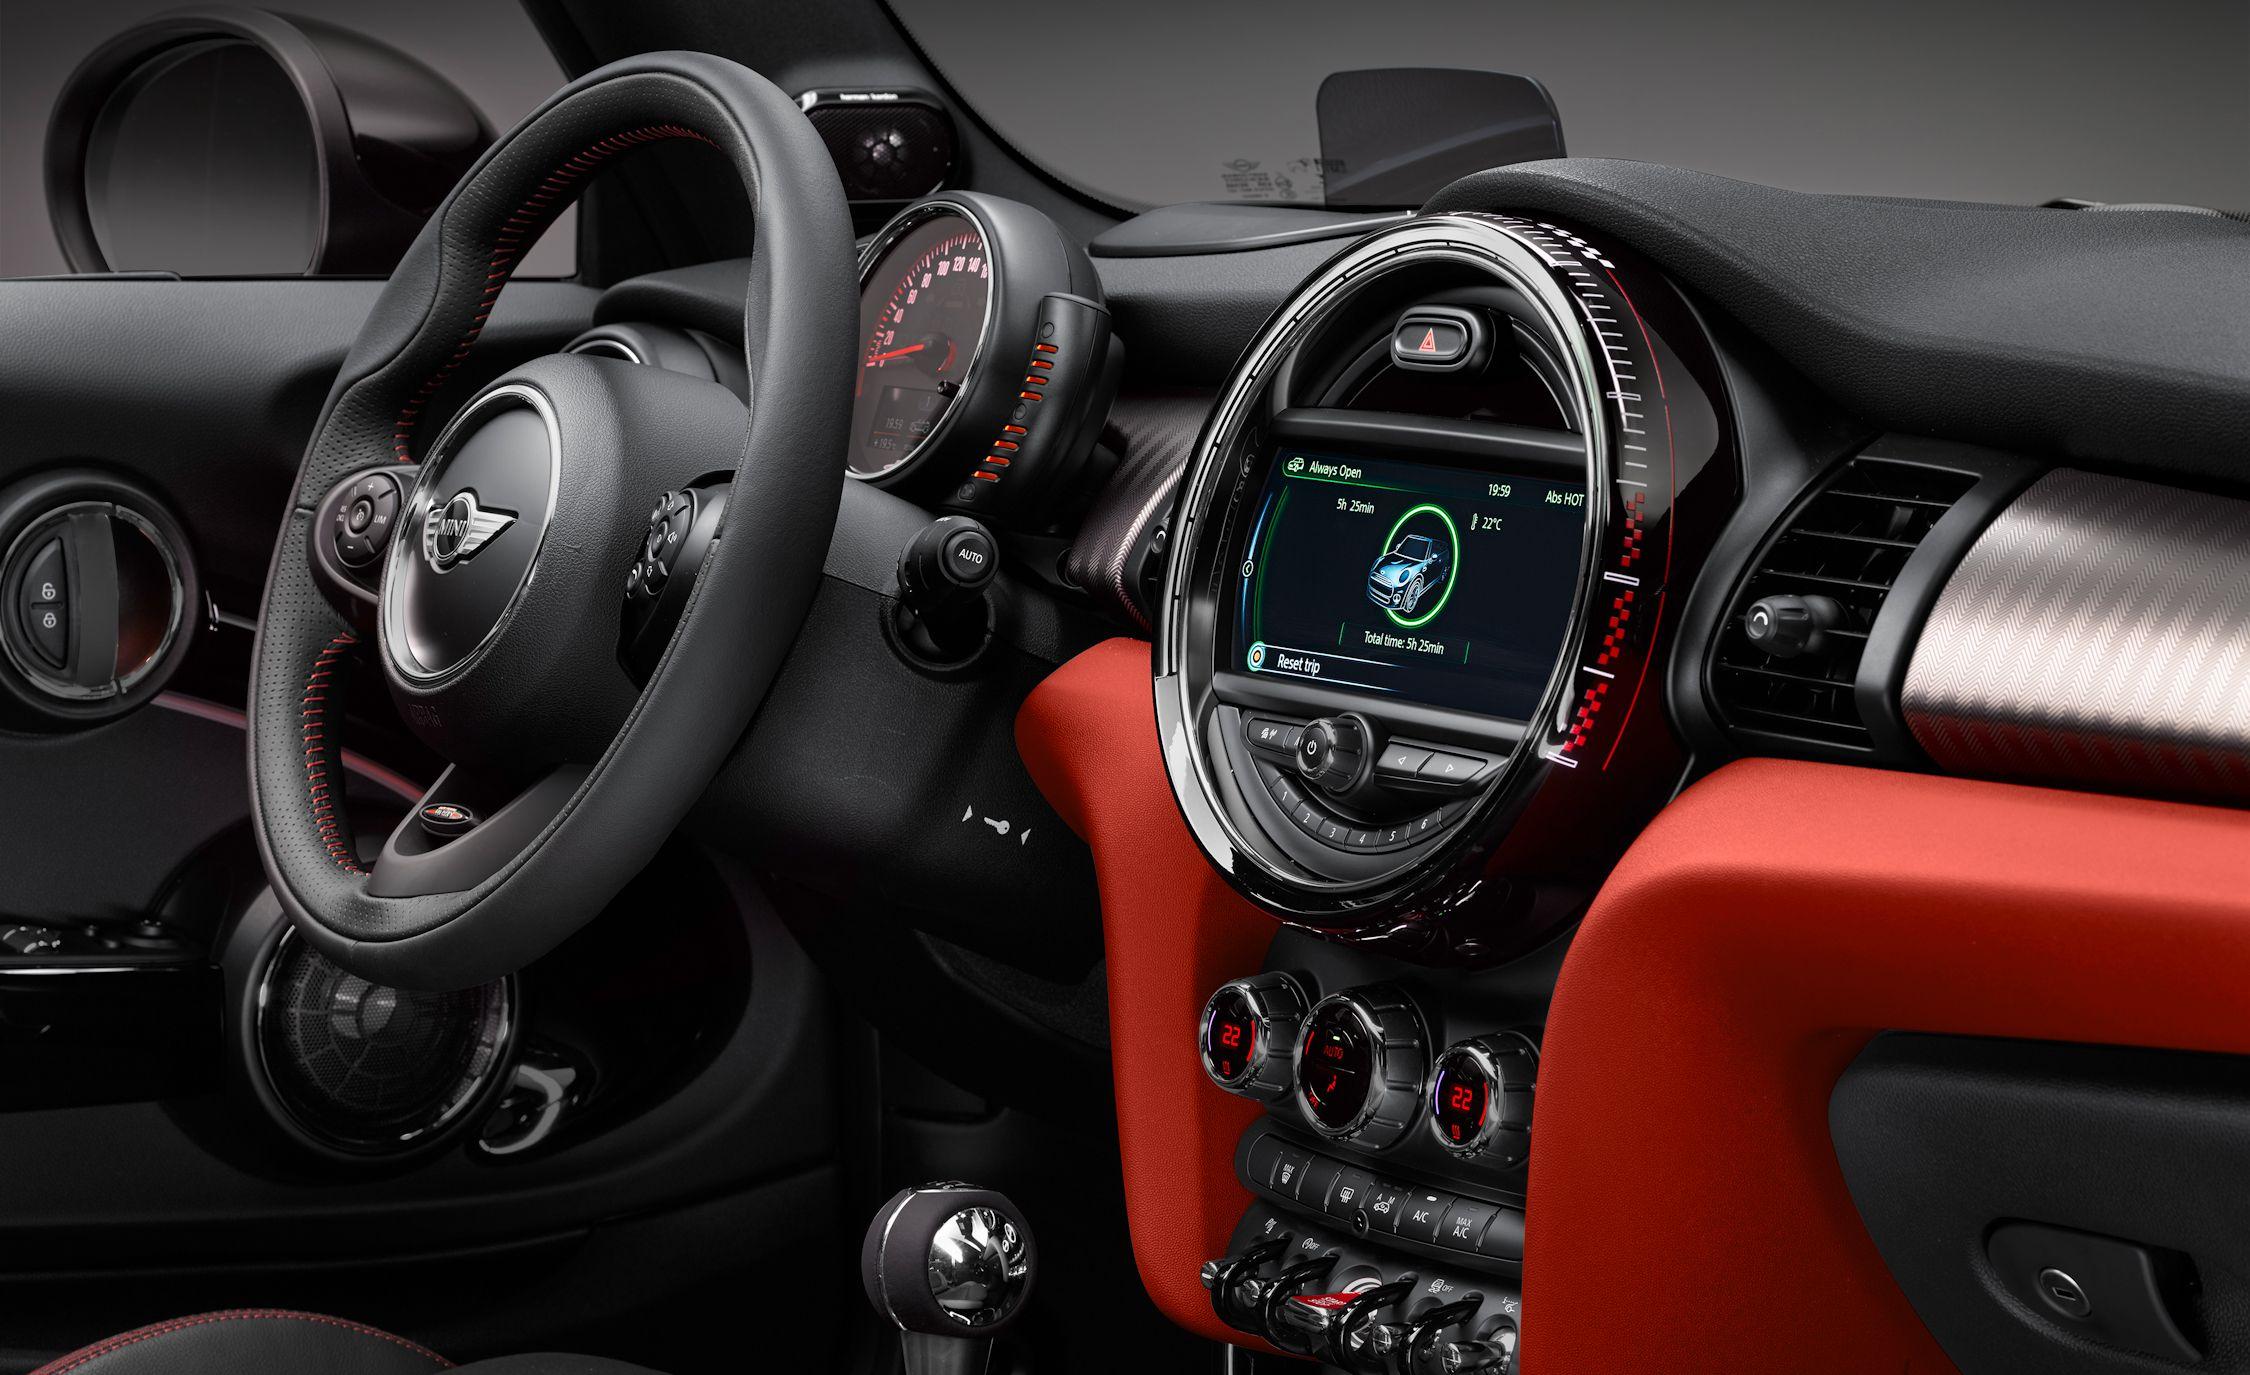 New Mini Cooper S Jcw Convertibles Priced Start Under 27 000